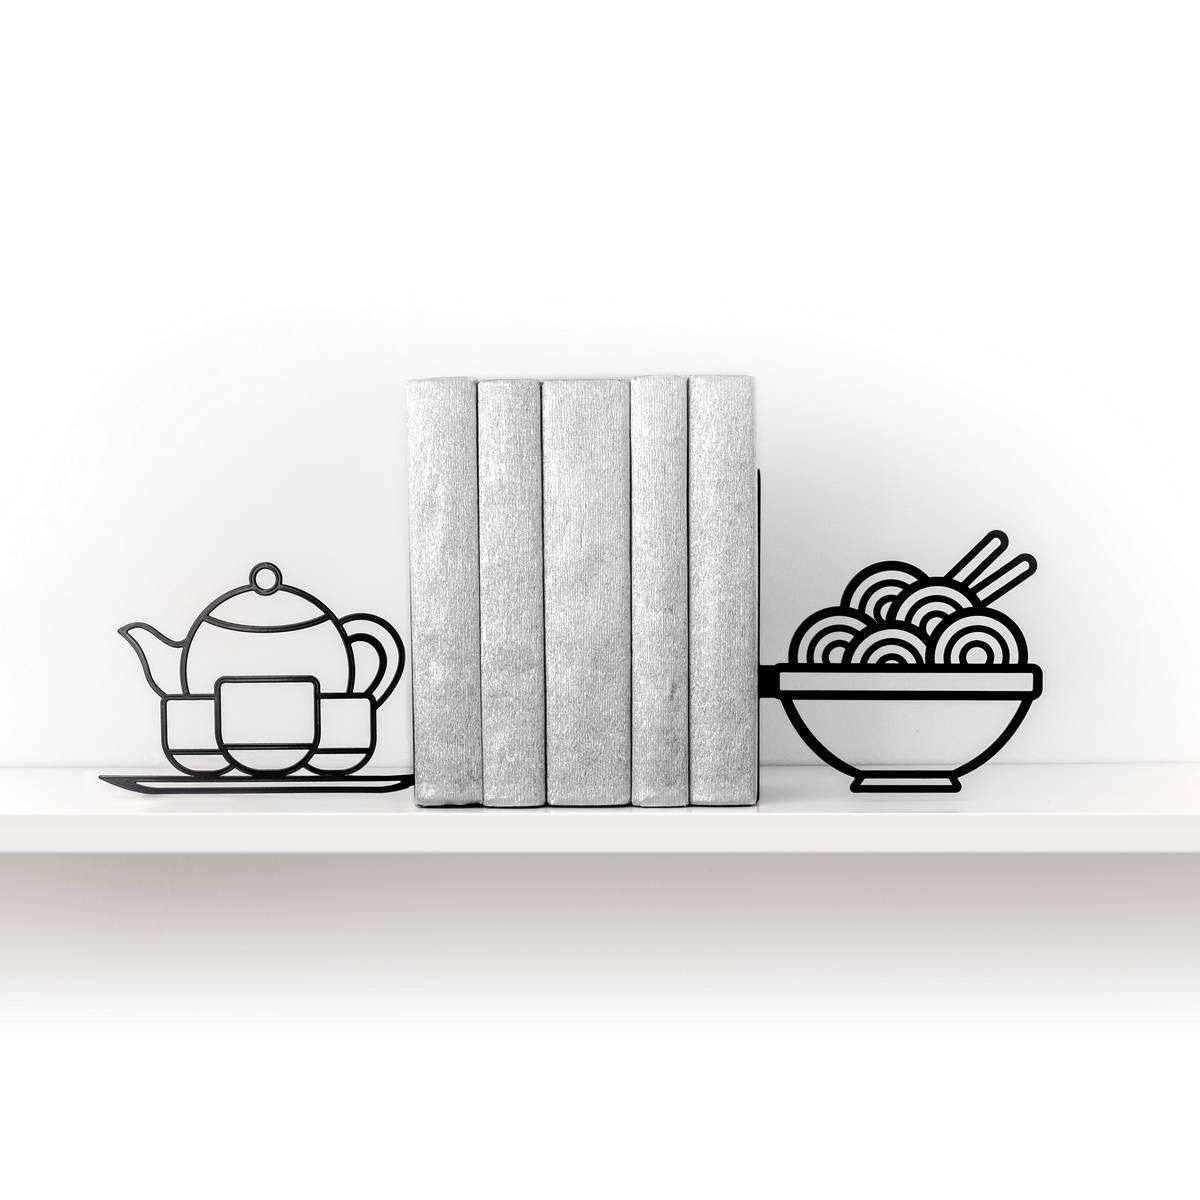 Kitchen Decor Ends: Noodle Bookends Foodie Book Ends Kitchen Decor Metal